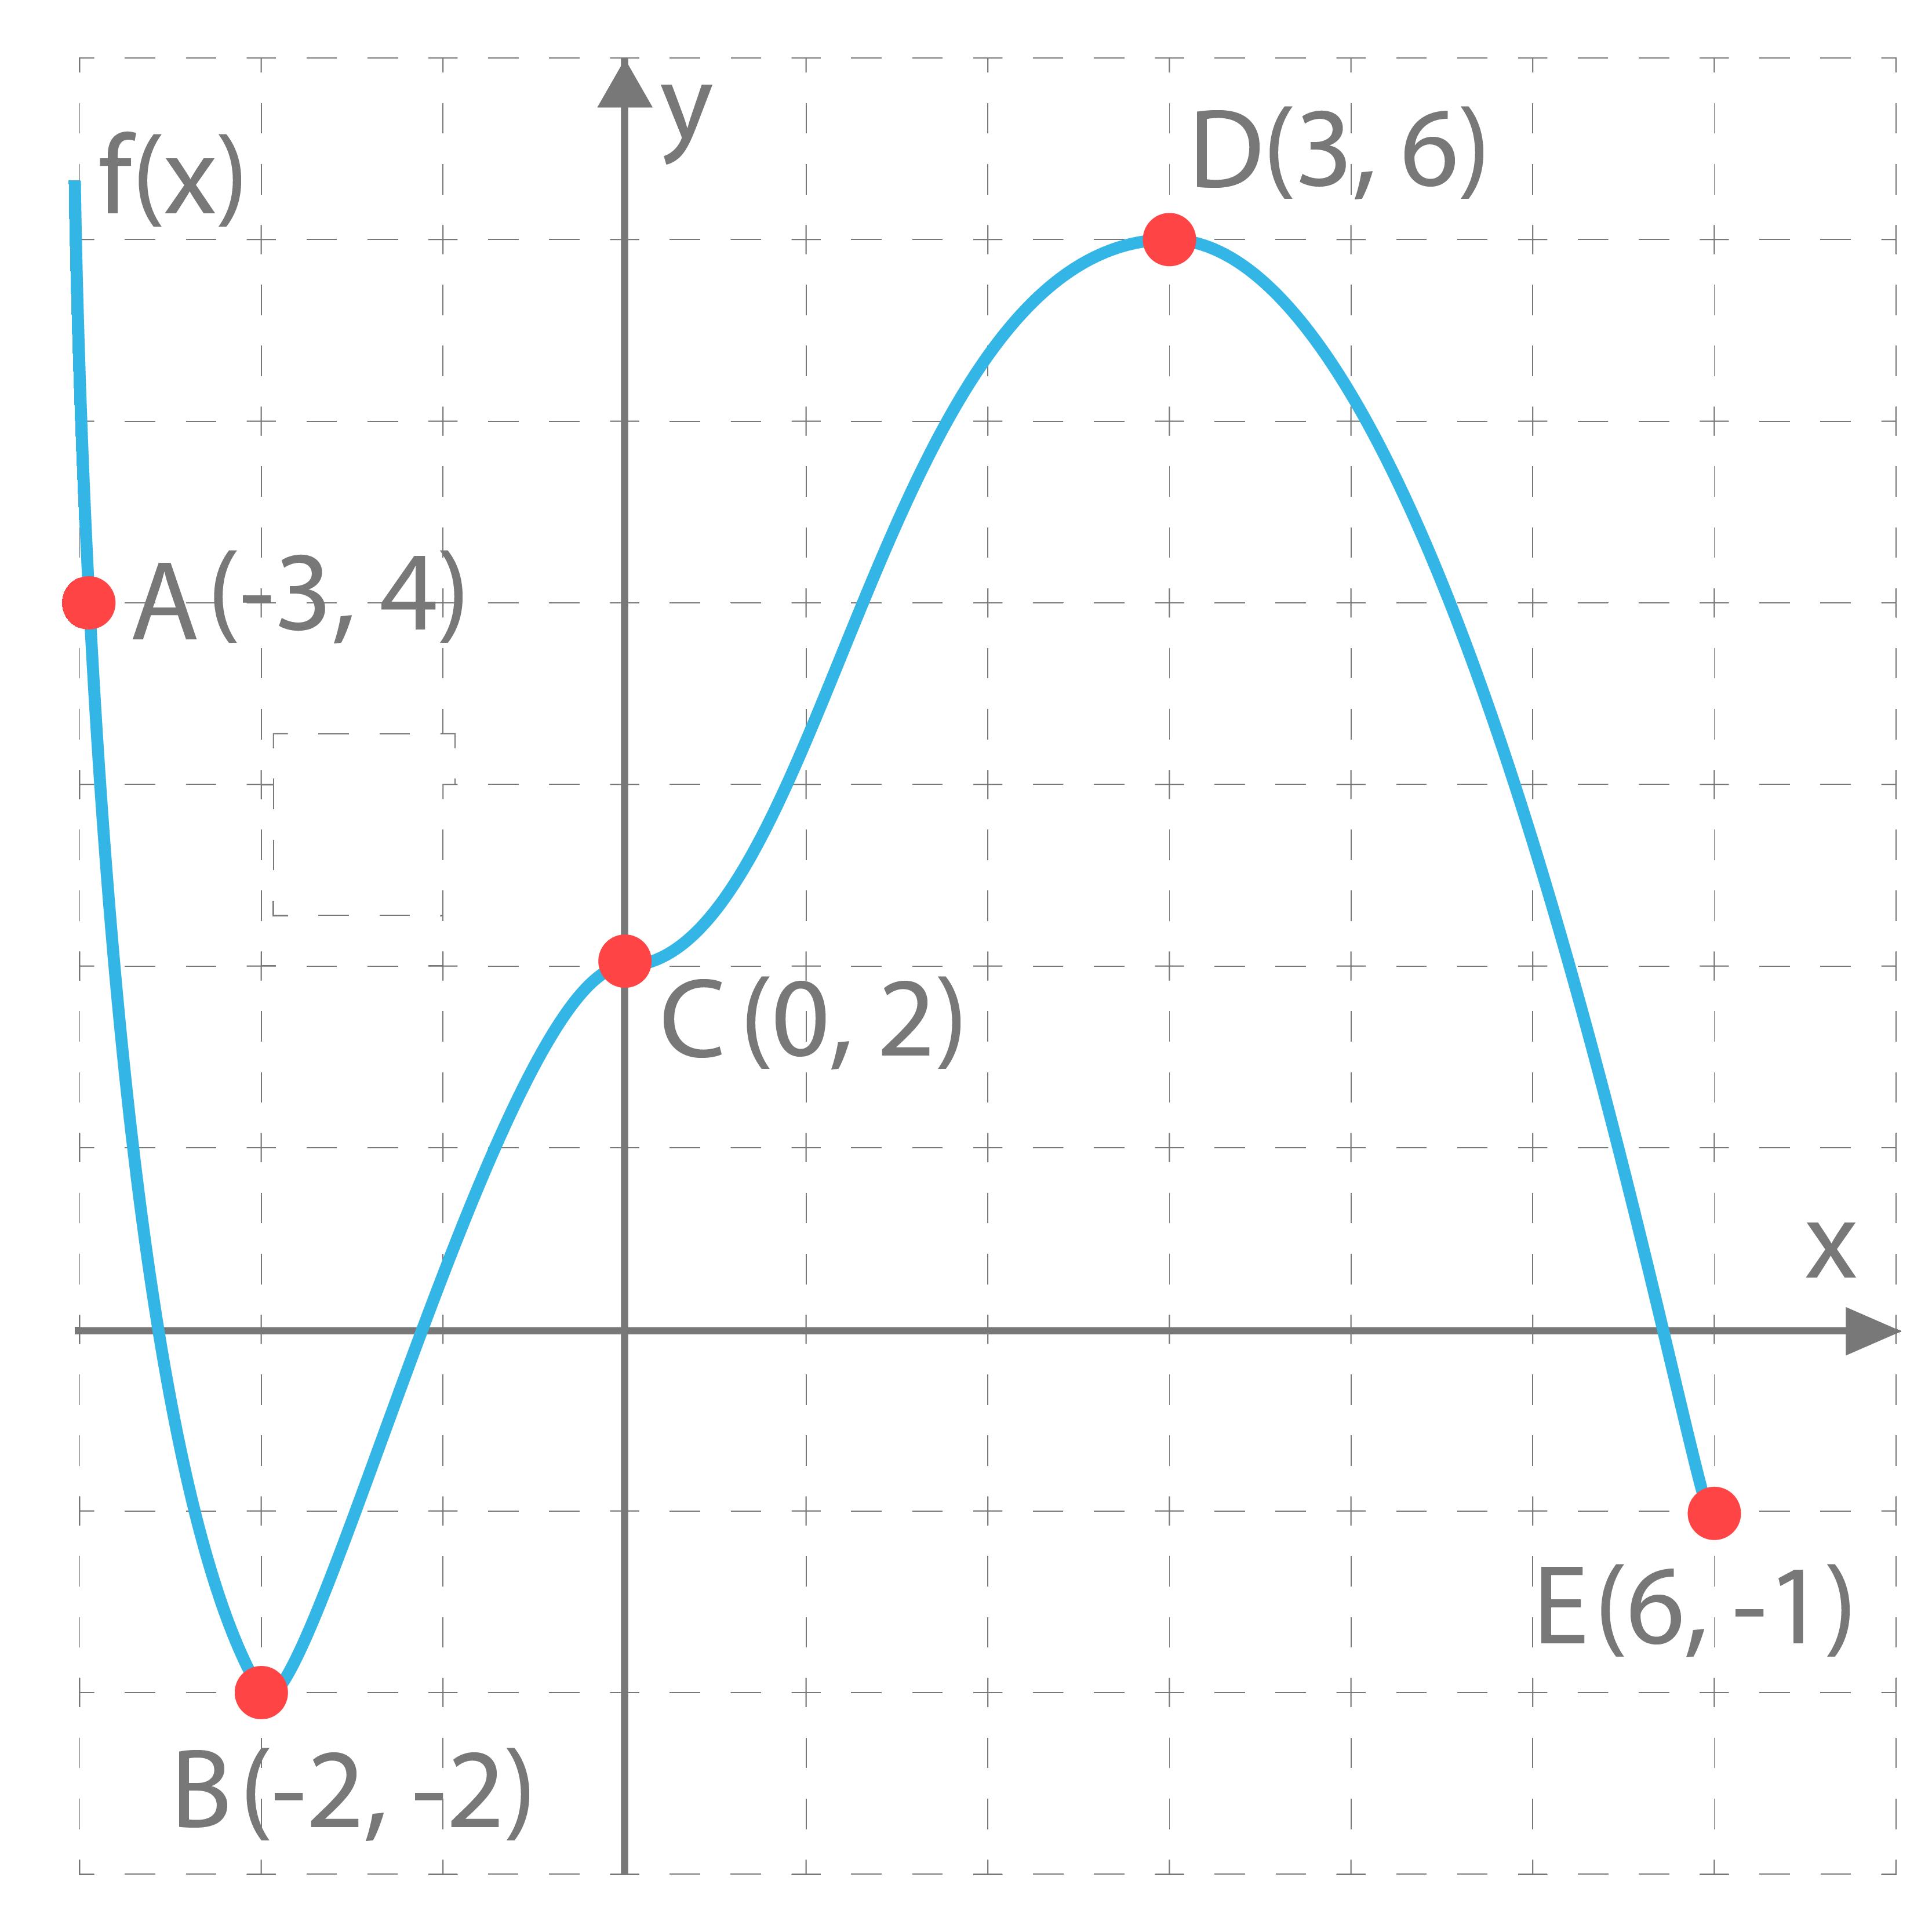 koordinatsystem_polynomfunktion-1-01-01